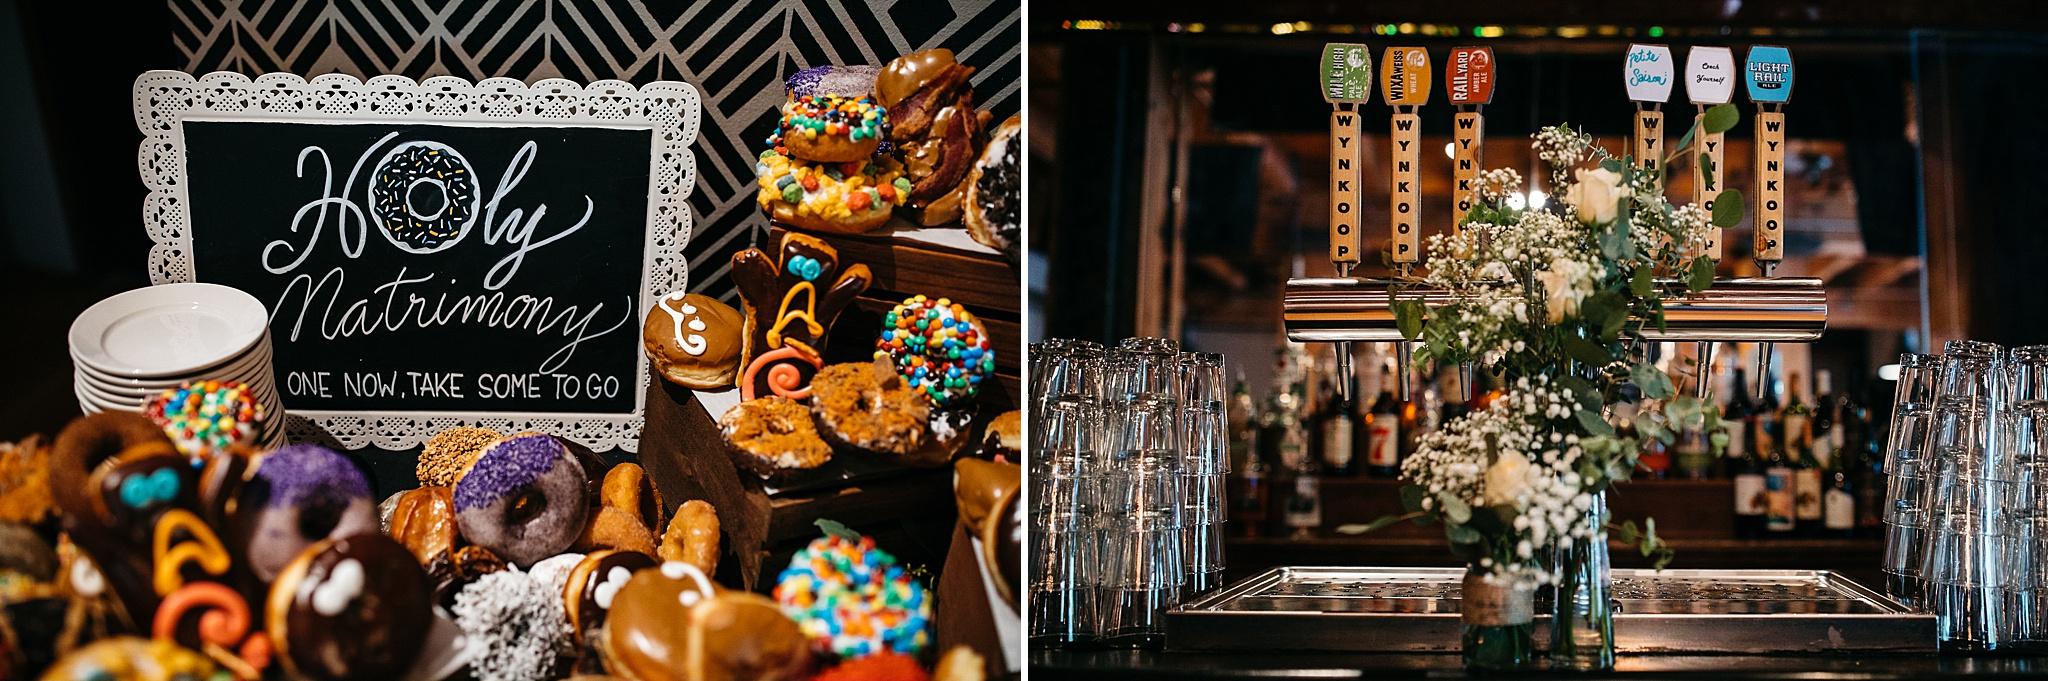 Voodoo doughnuts and beer…UM YES.